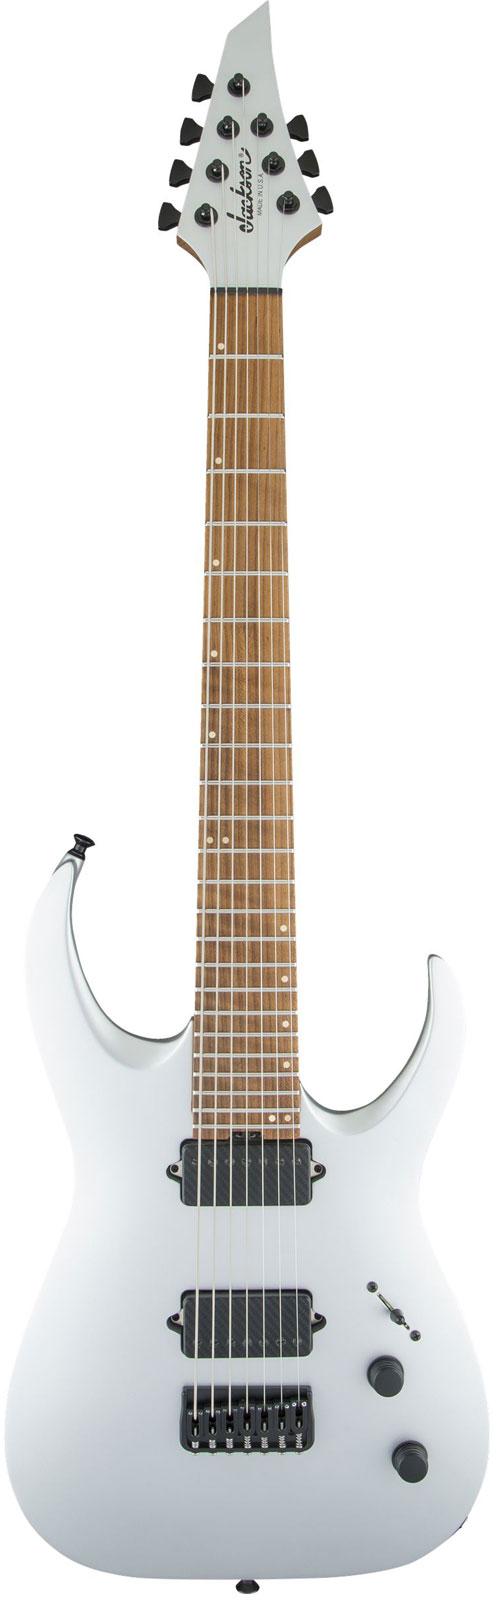 Jackson Guitars Usa Signature Misha Mansoor Juggernaut Ht7 Caramelized Flame Maple Fingerboard Satin Silver